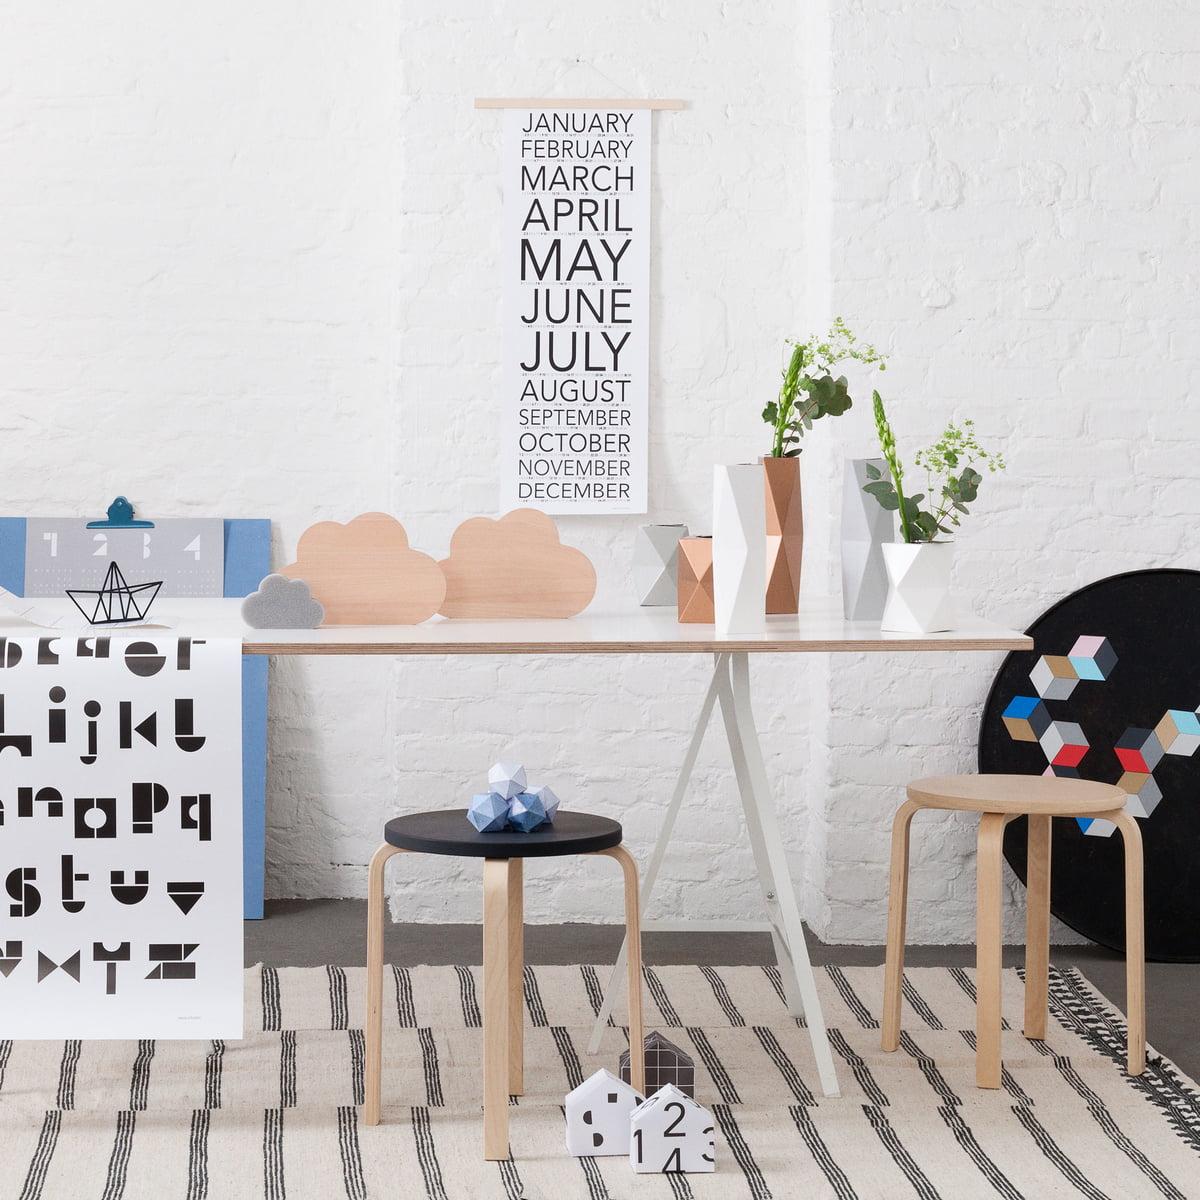 Achetez le calendrier mural 2017 de snug studio for Grand calendrier mural 2017